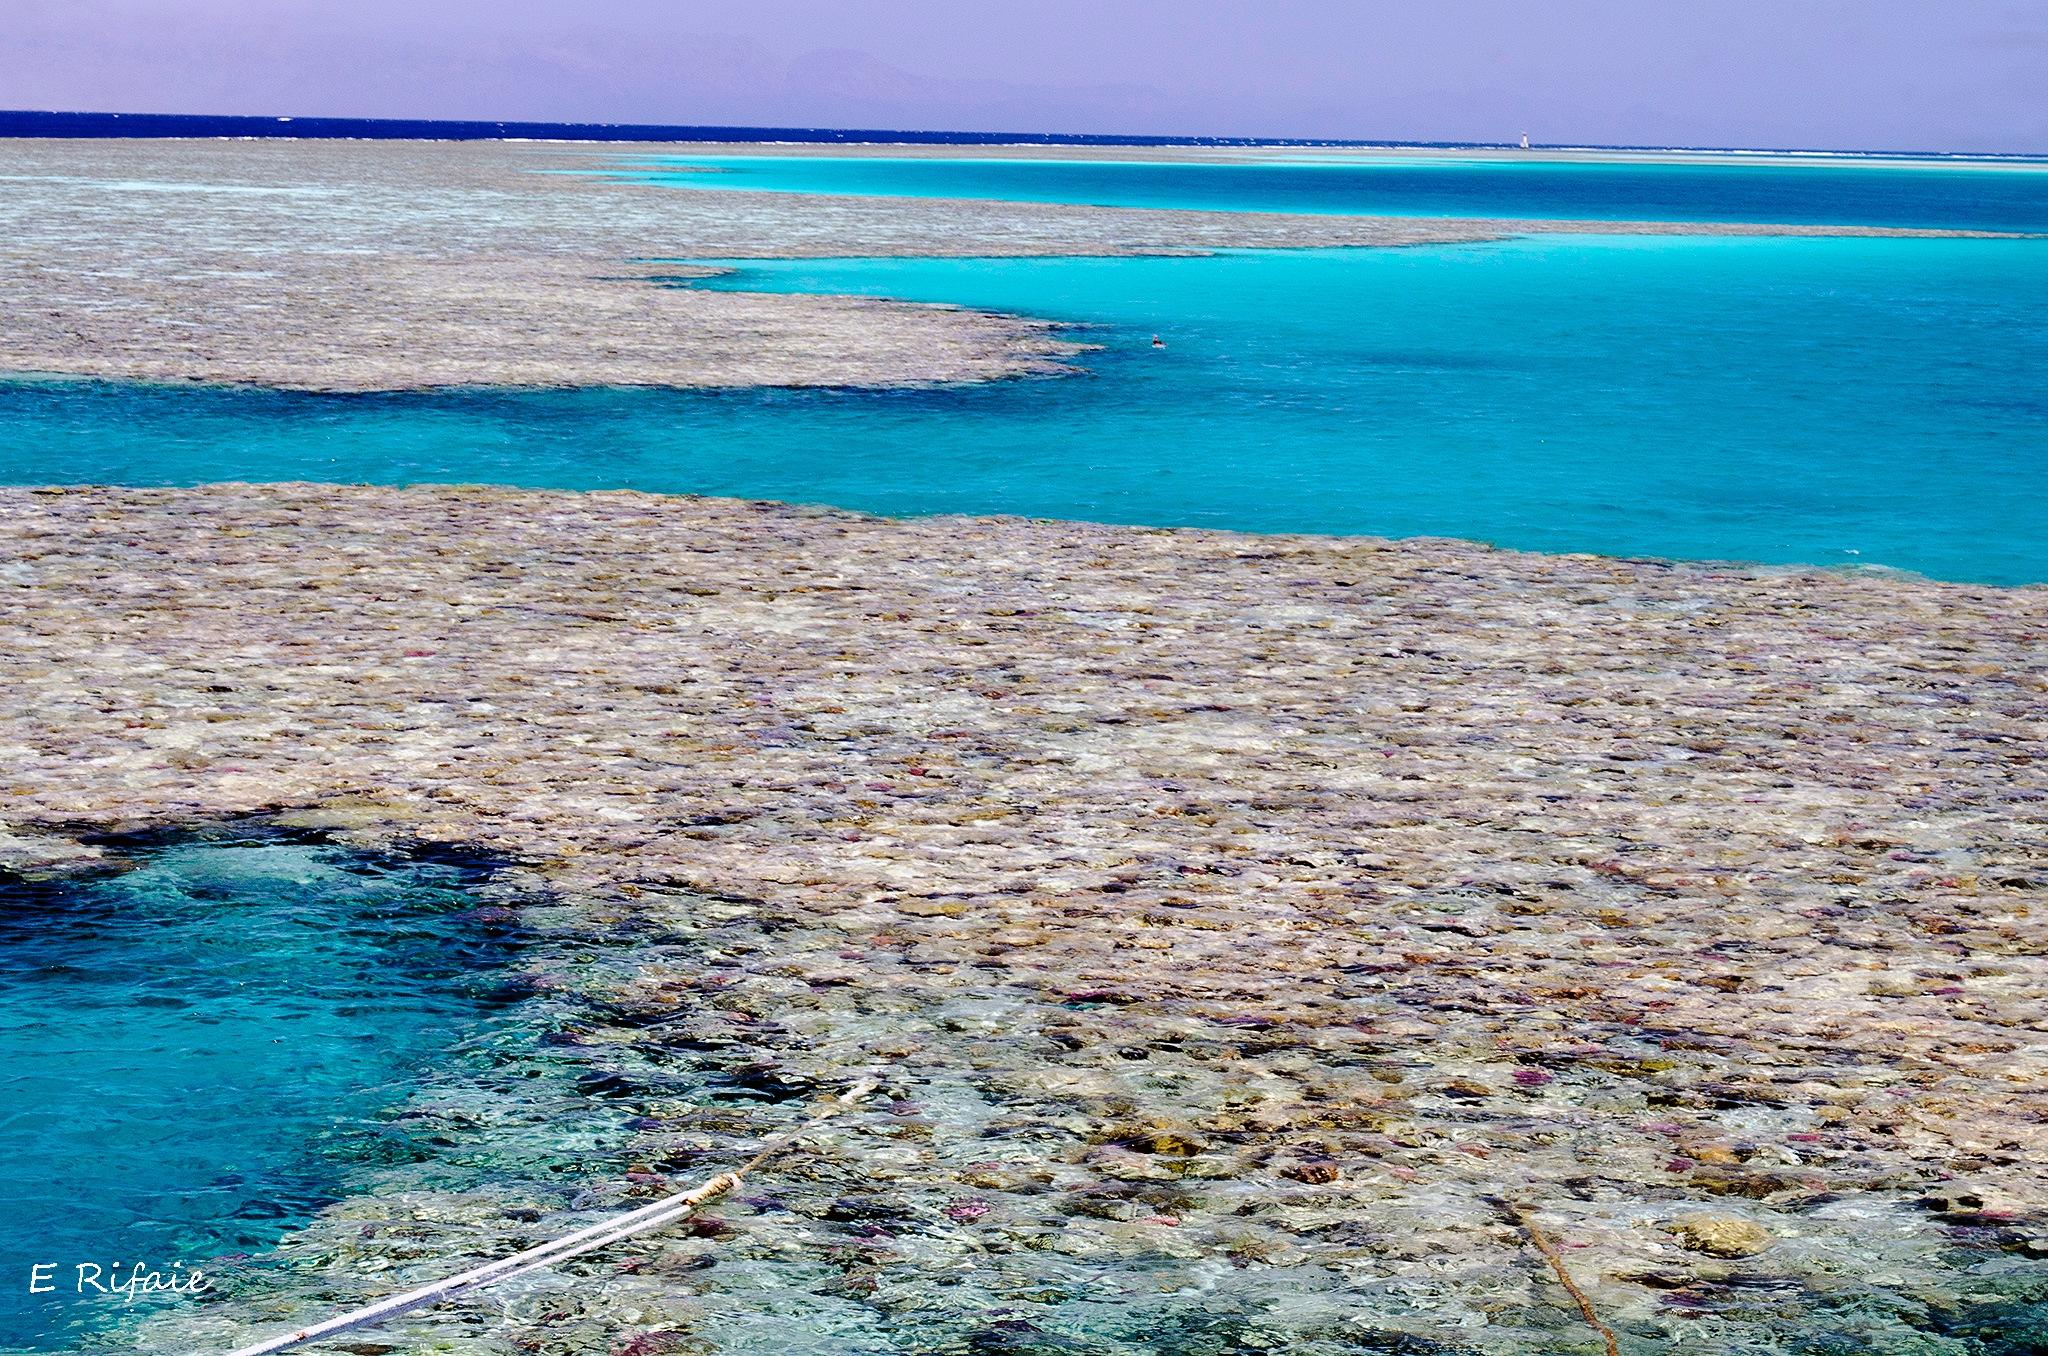 Coral reefs in the Red Sea by Emad Eldin Moustafa El Refaie